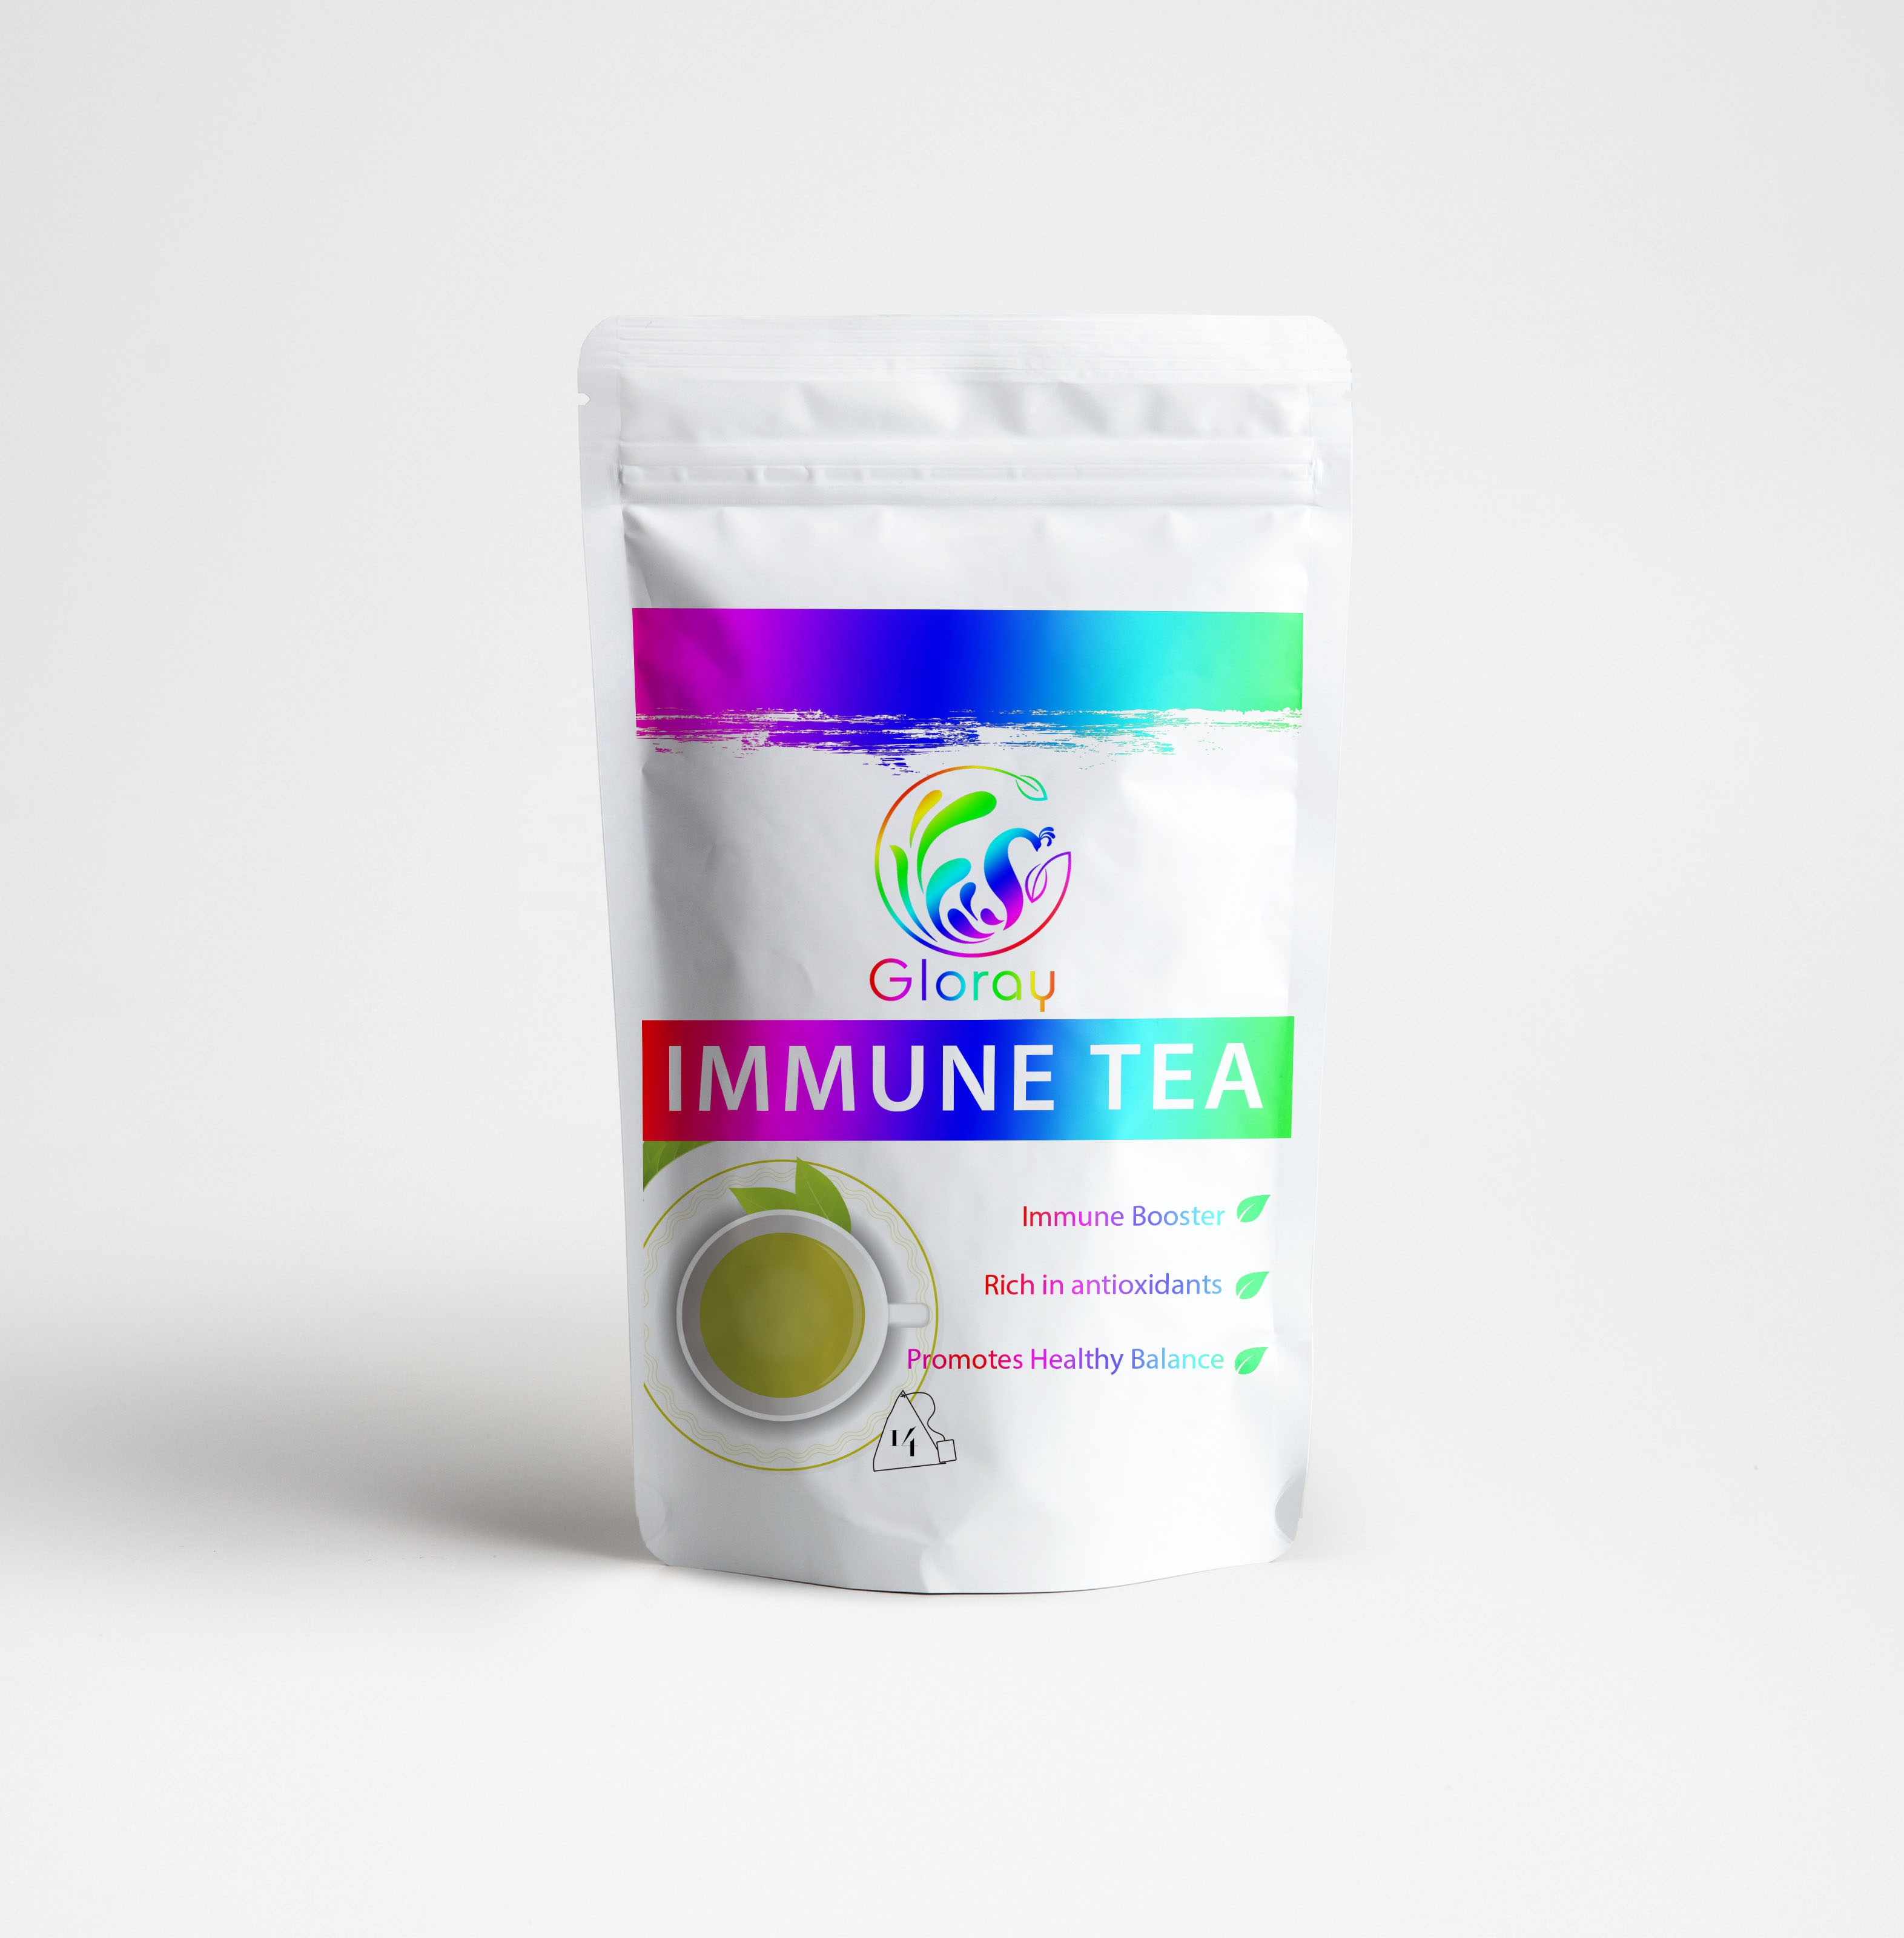 Private Your Brand Slim Tea Acai Berry 28 Tea Bags (100% Natural, Sugar Free, Gluten Free and Non-GMO) - 4uTea | 4uTea.com